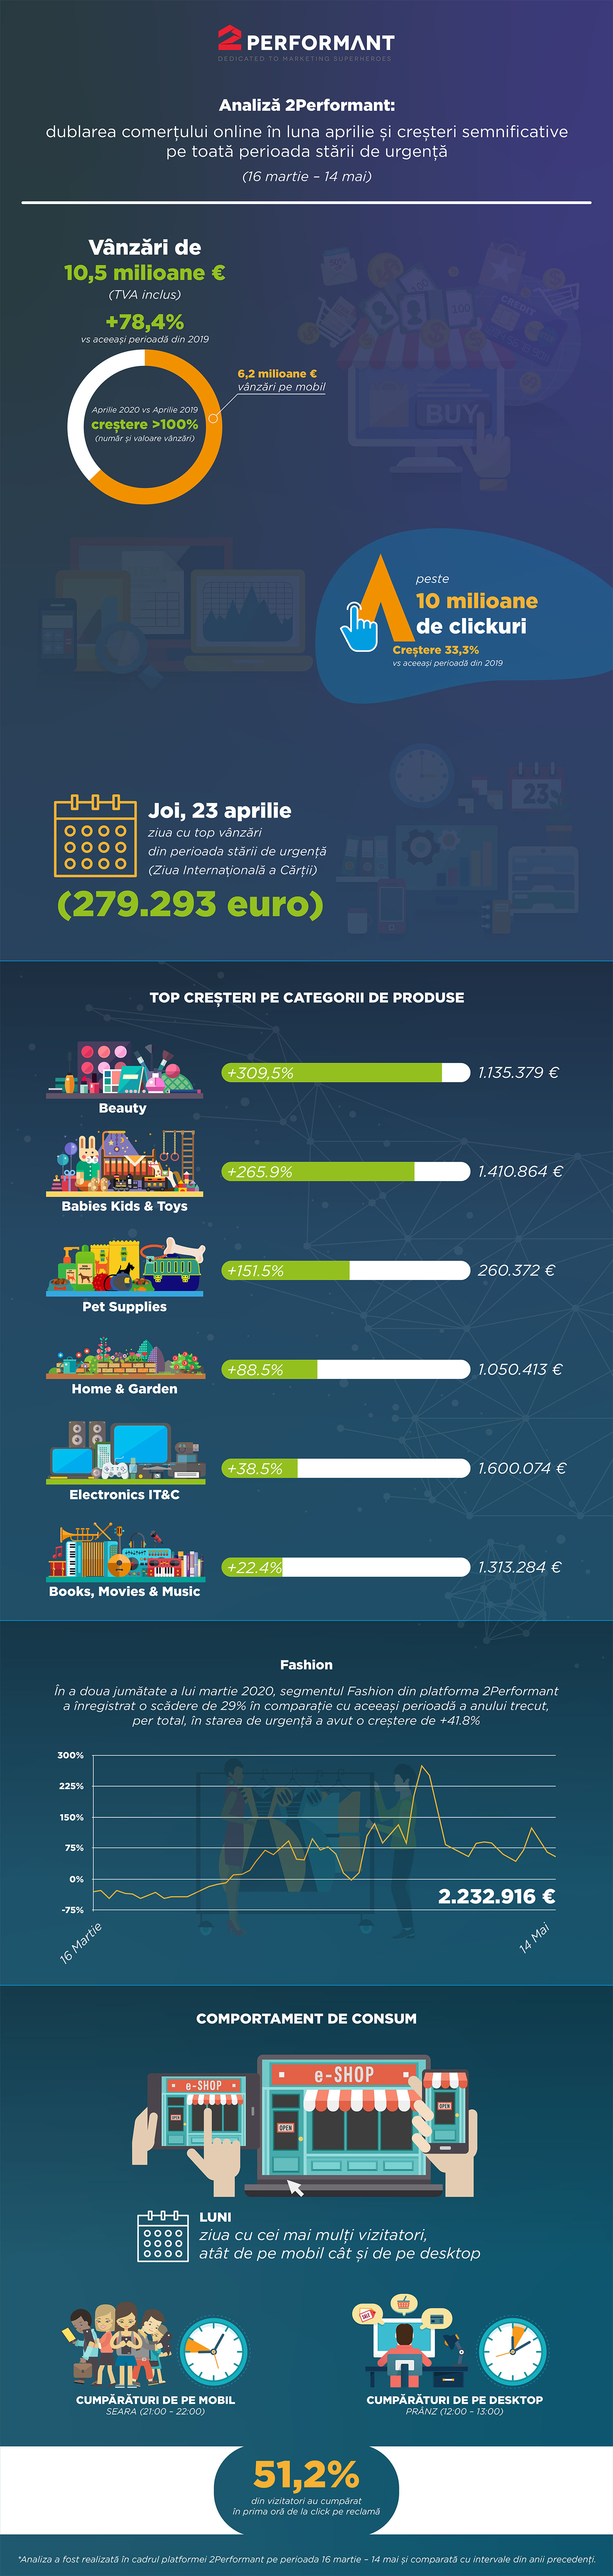 Infografic - Analiza 2Performant - dublarea comertului online in luna aprilie si cresteri semnificative pe toata perioada starii de urgenta